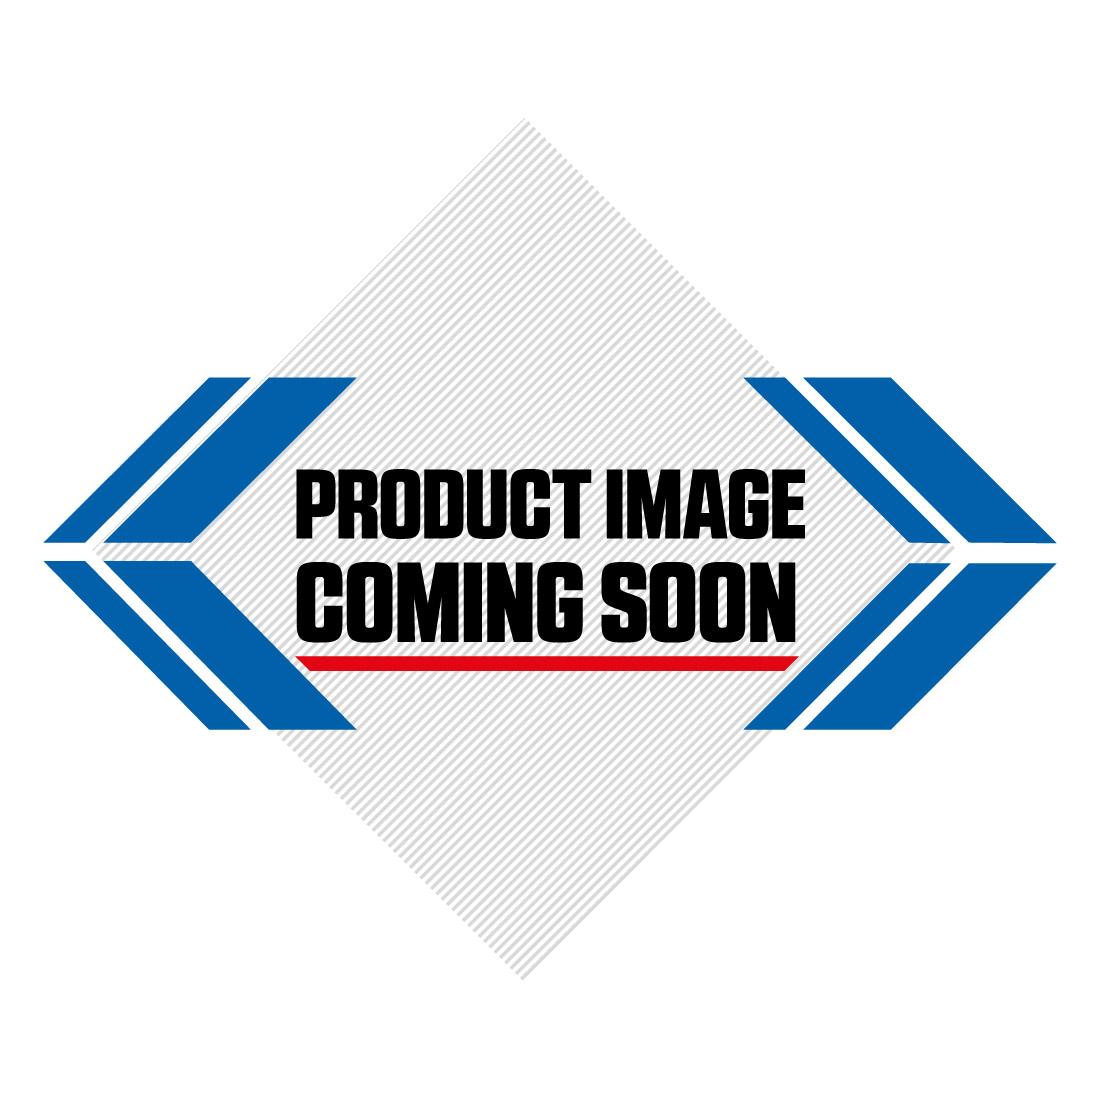 Renthal Twinring Rear Sprocket Kawasaki KX KXF KDX KLX Suzuki RMZ - Green Image-3>